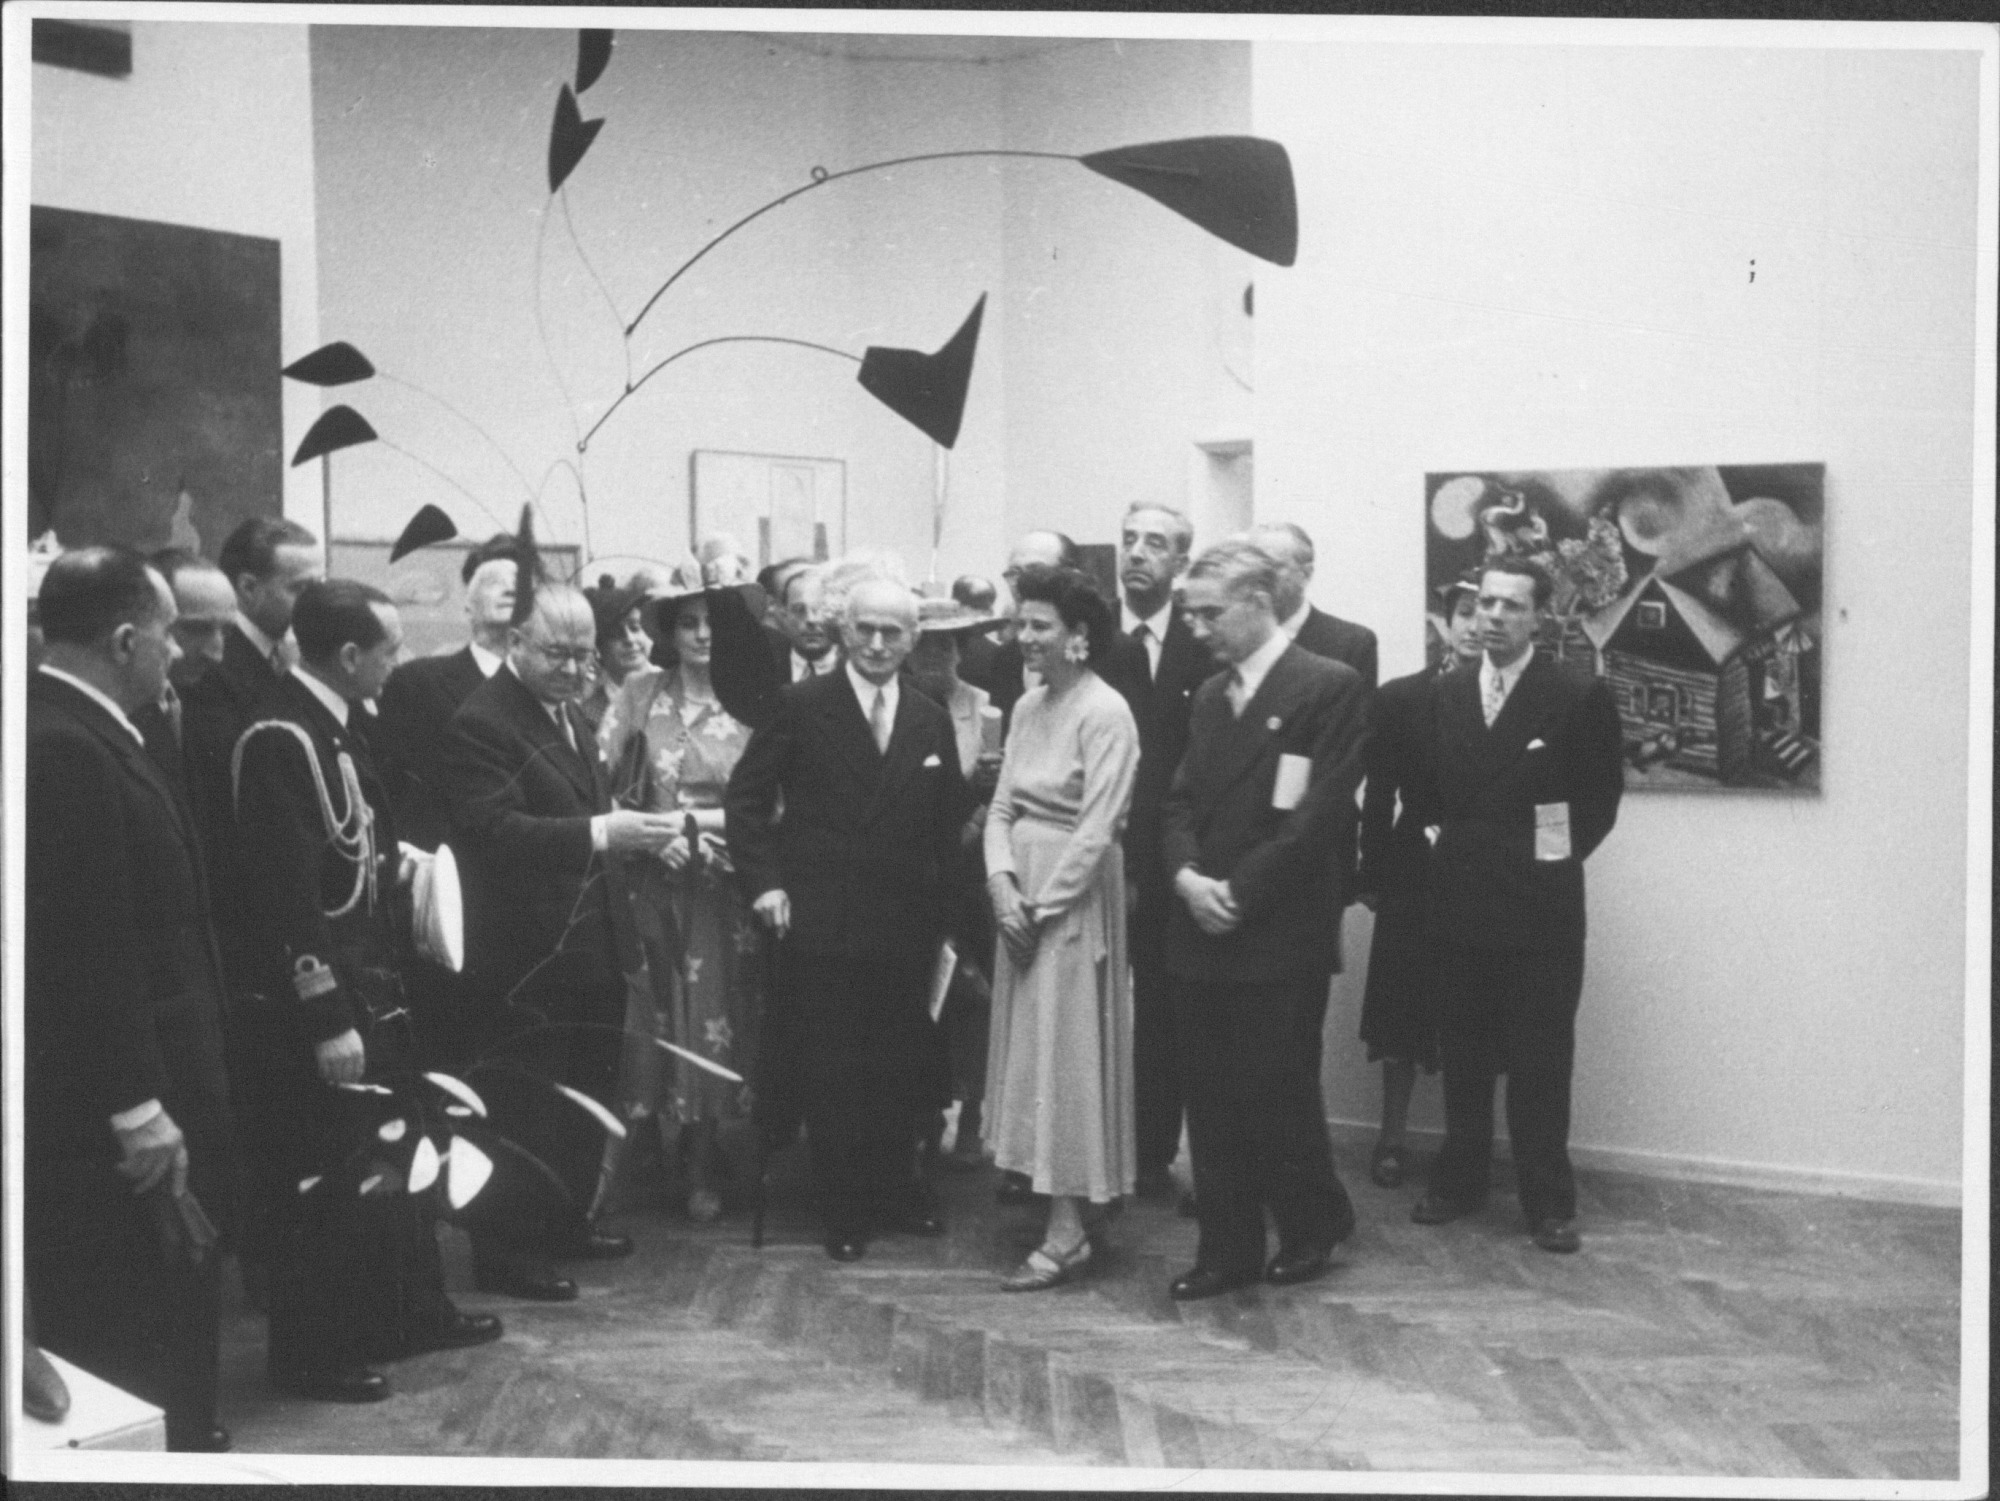 Exhibitions, Unidentified